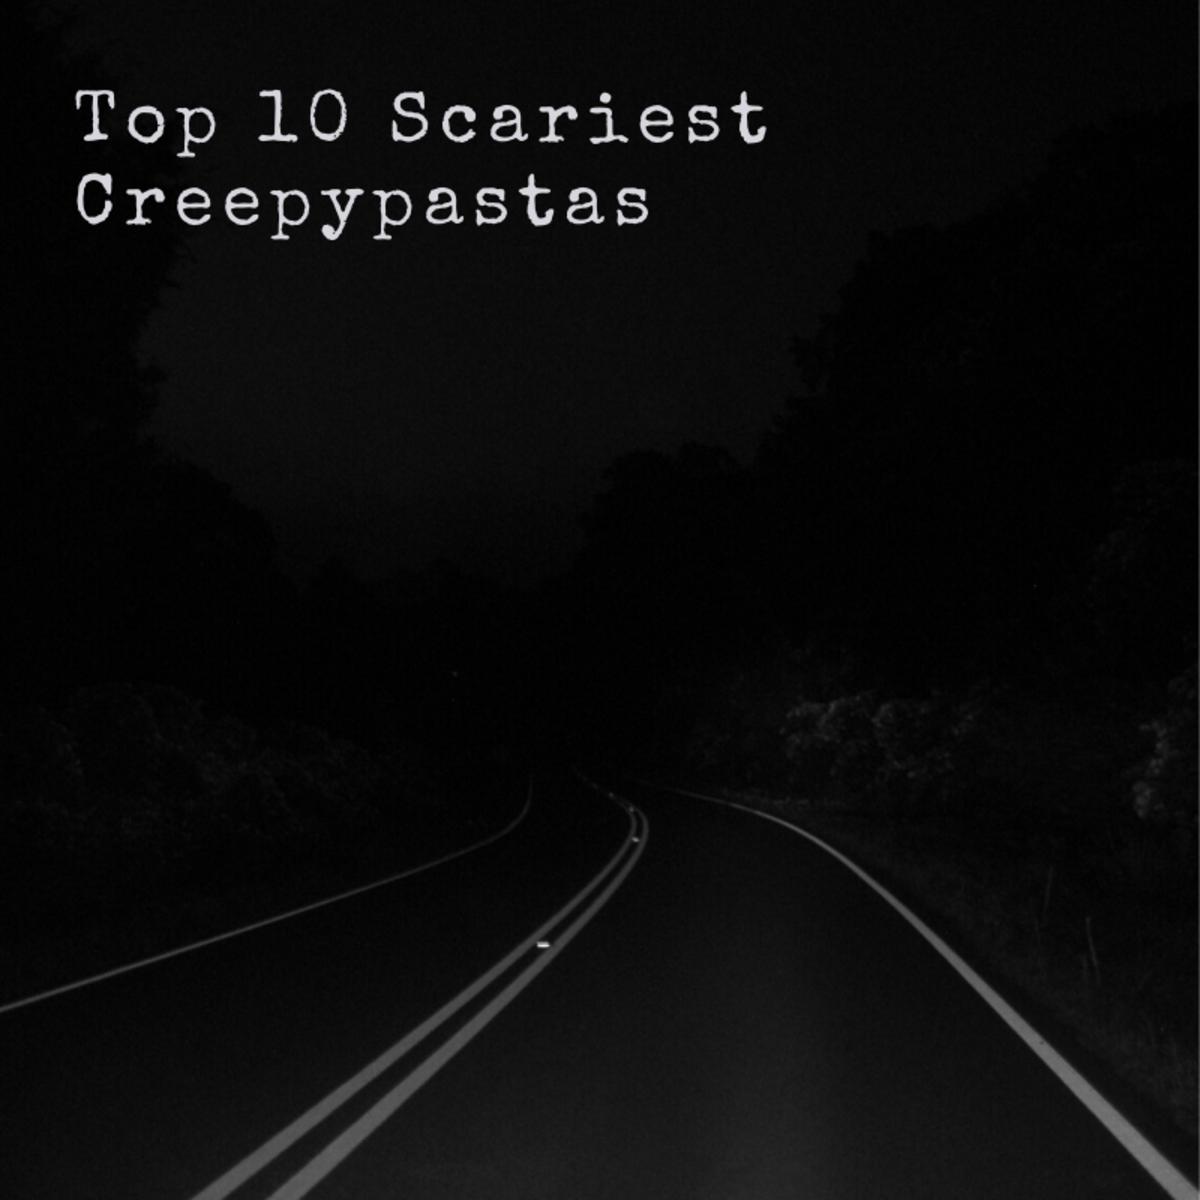 10 of the Scariest Creepypastas Ever Written